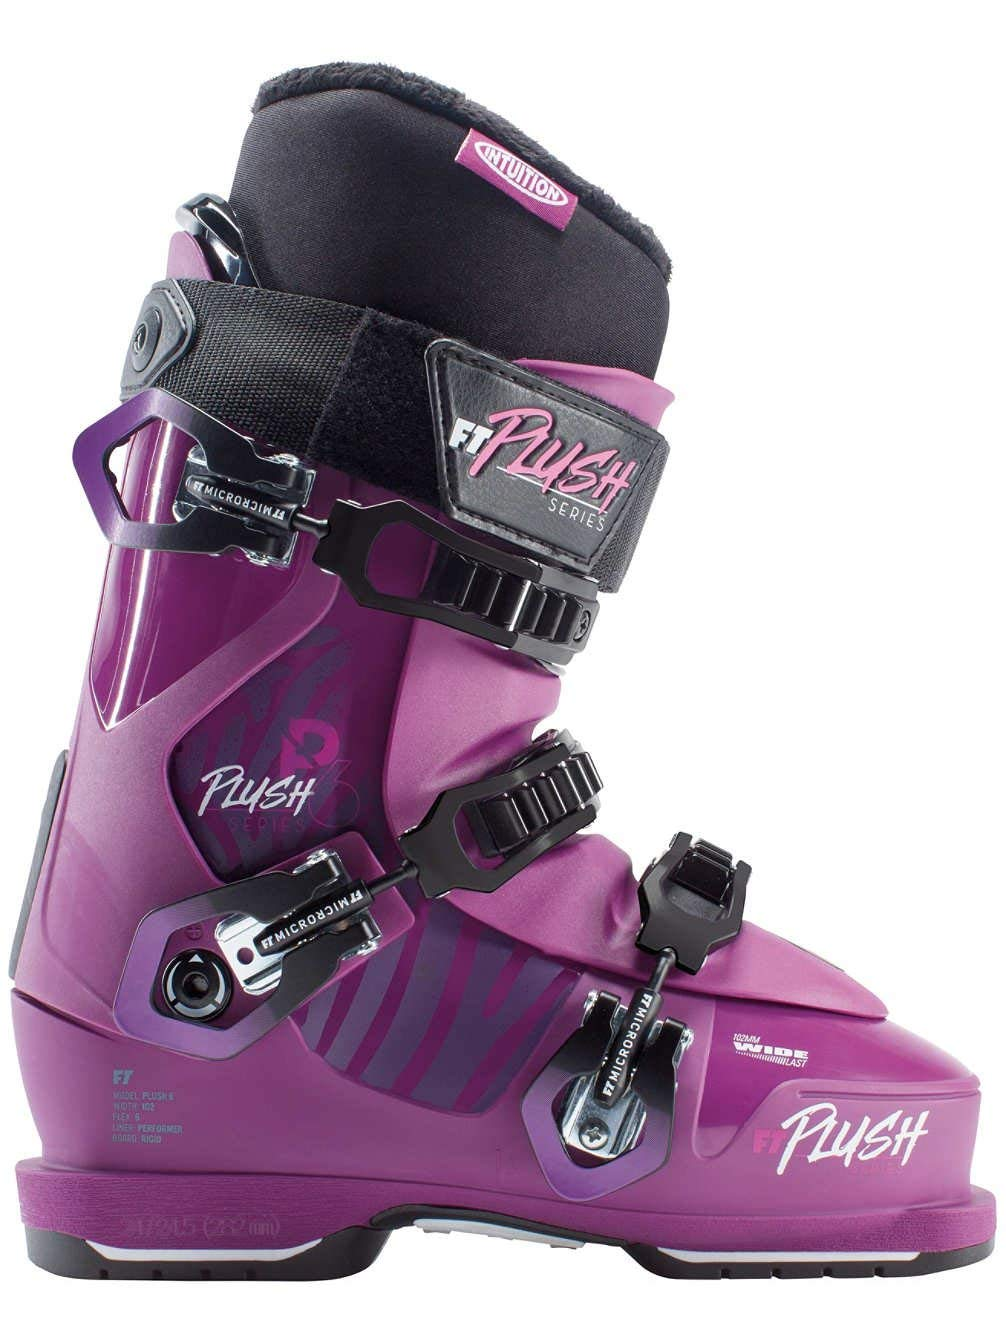 6a204a8dfd Get Quotations · Full Tilt Womens Plush 6 Ski Boots 2018